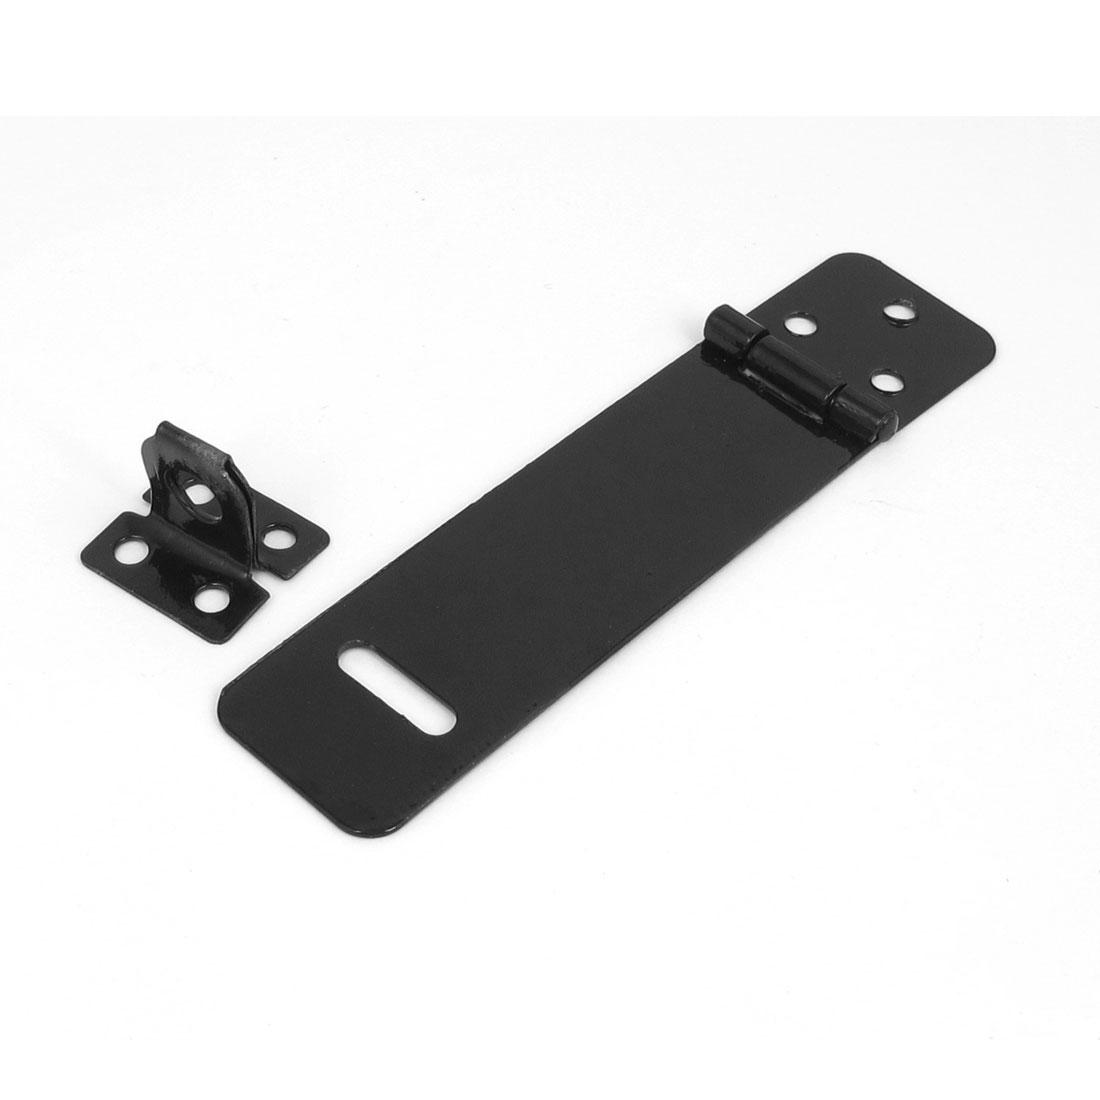 Rectangle Black Metal Security Safety Door Clasp Gate Lock Padlock Hasp Staple